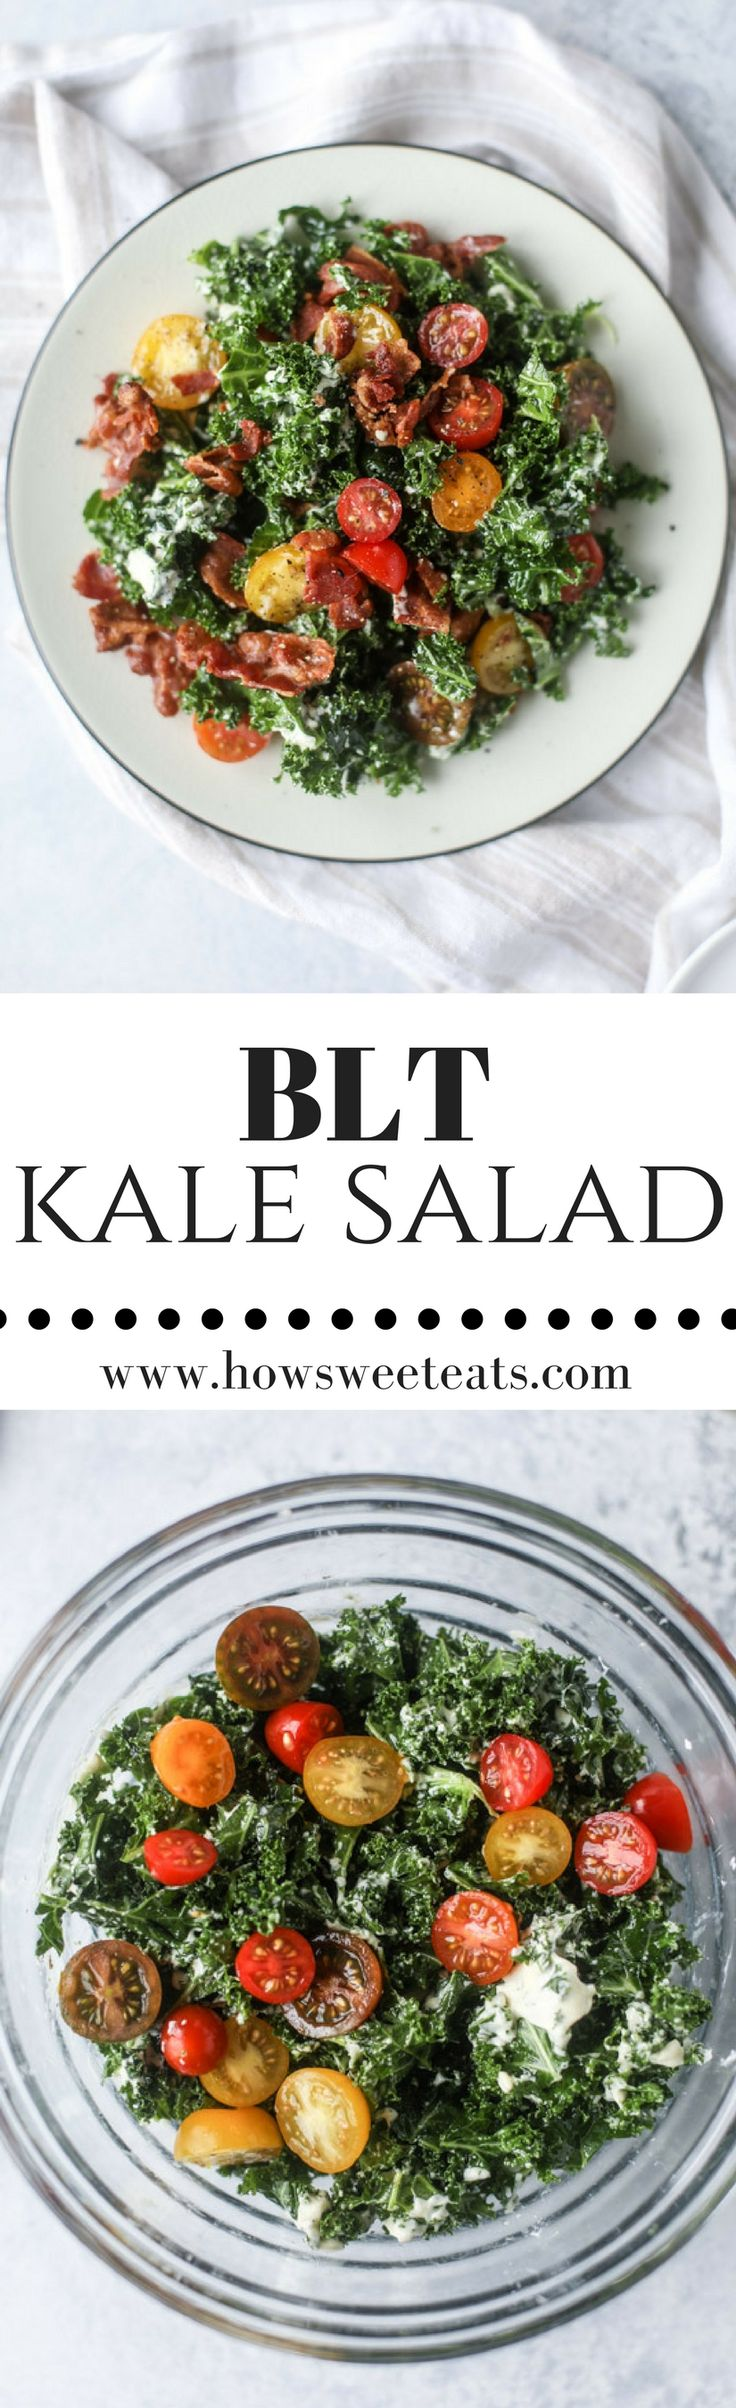 BLT Shredded Kale Salad with Greek Yogurt Ranch Dressing I howsweeteats.com @howsweeteats